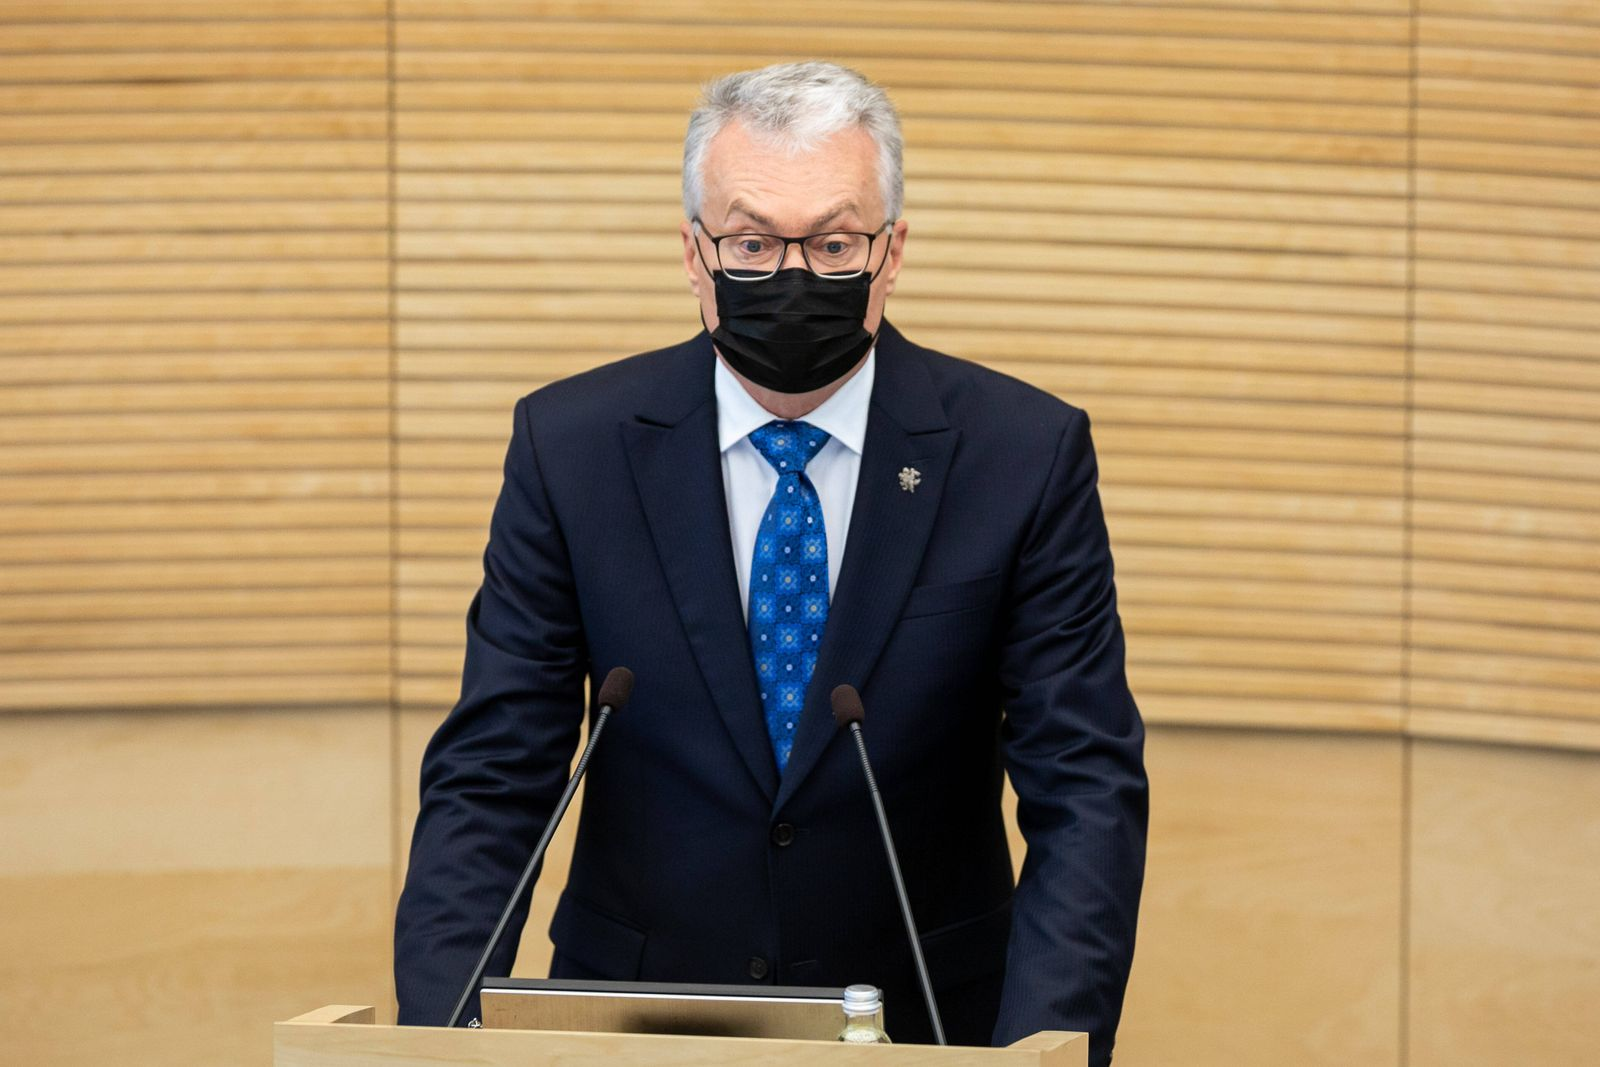 2021-06-08 Vilnius Lithuania. Lithuanian president Gitanas Nauseda delivers annual speech at Seimas (Parliament) on Tues